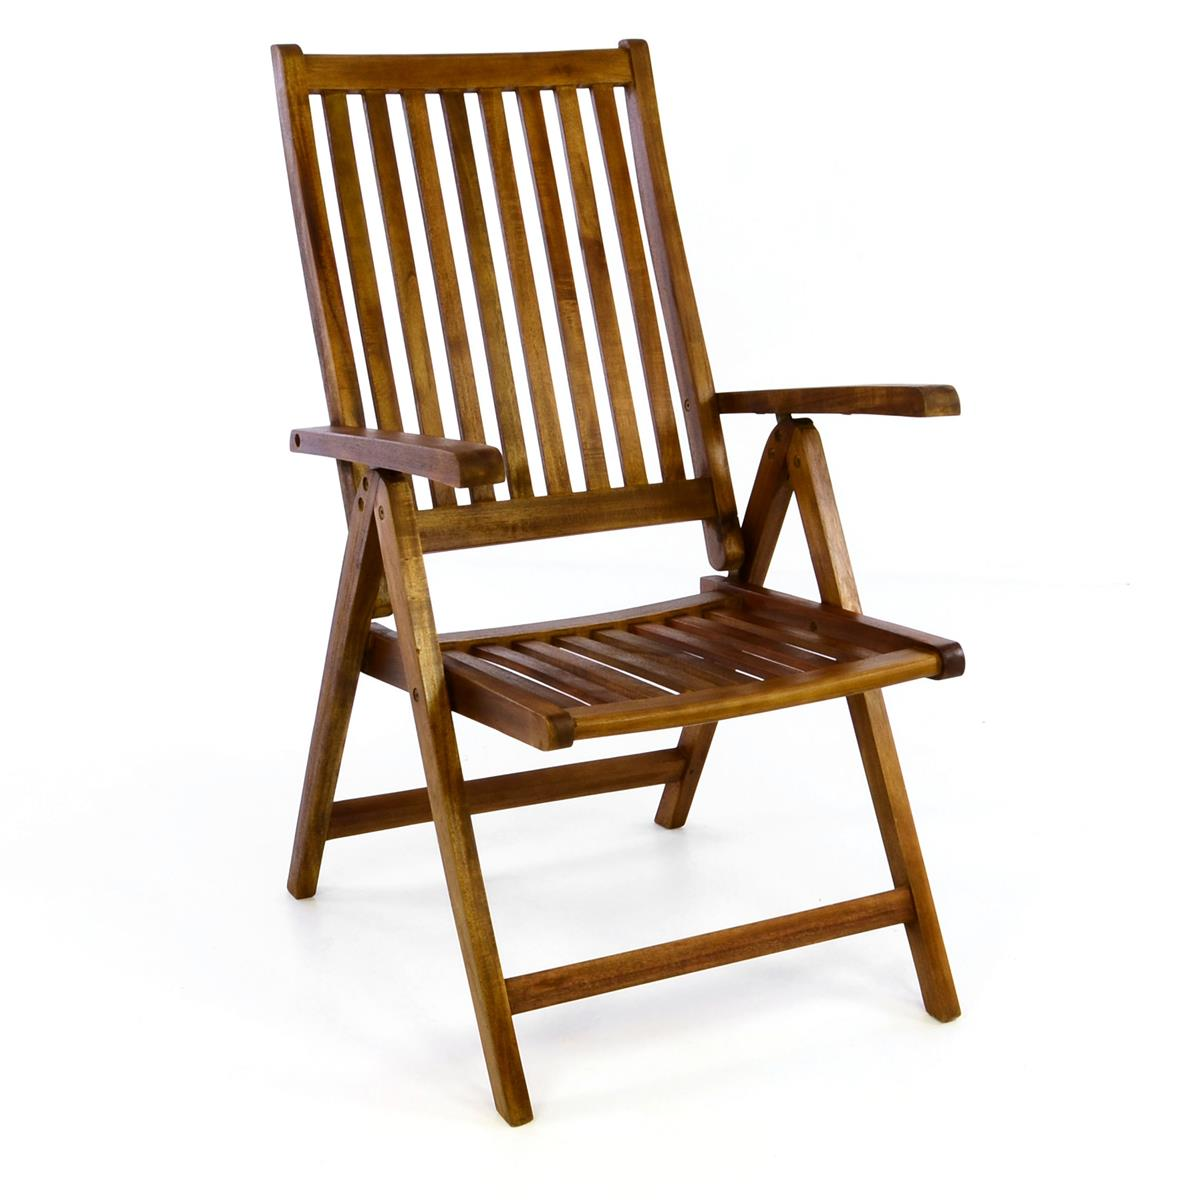 DIVERO Gartenstuhl Hochlehner Klappstuhl Stuhl Akazie Holz behandelt